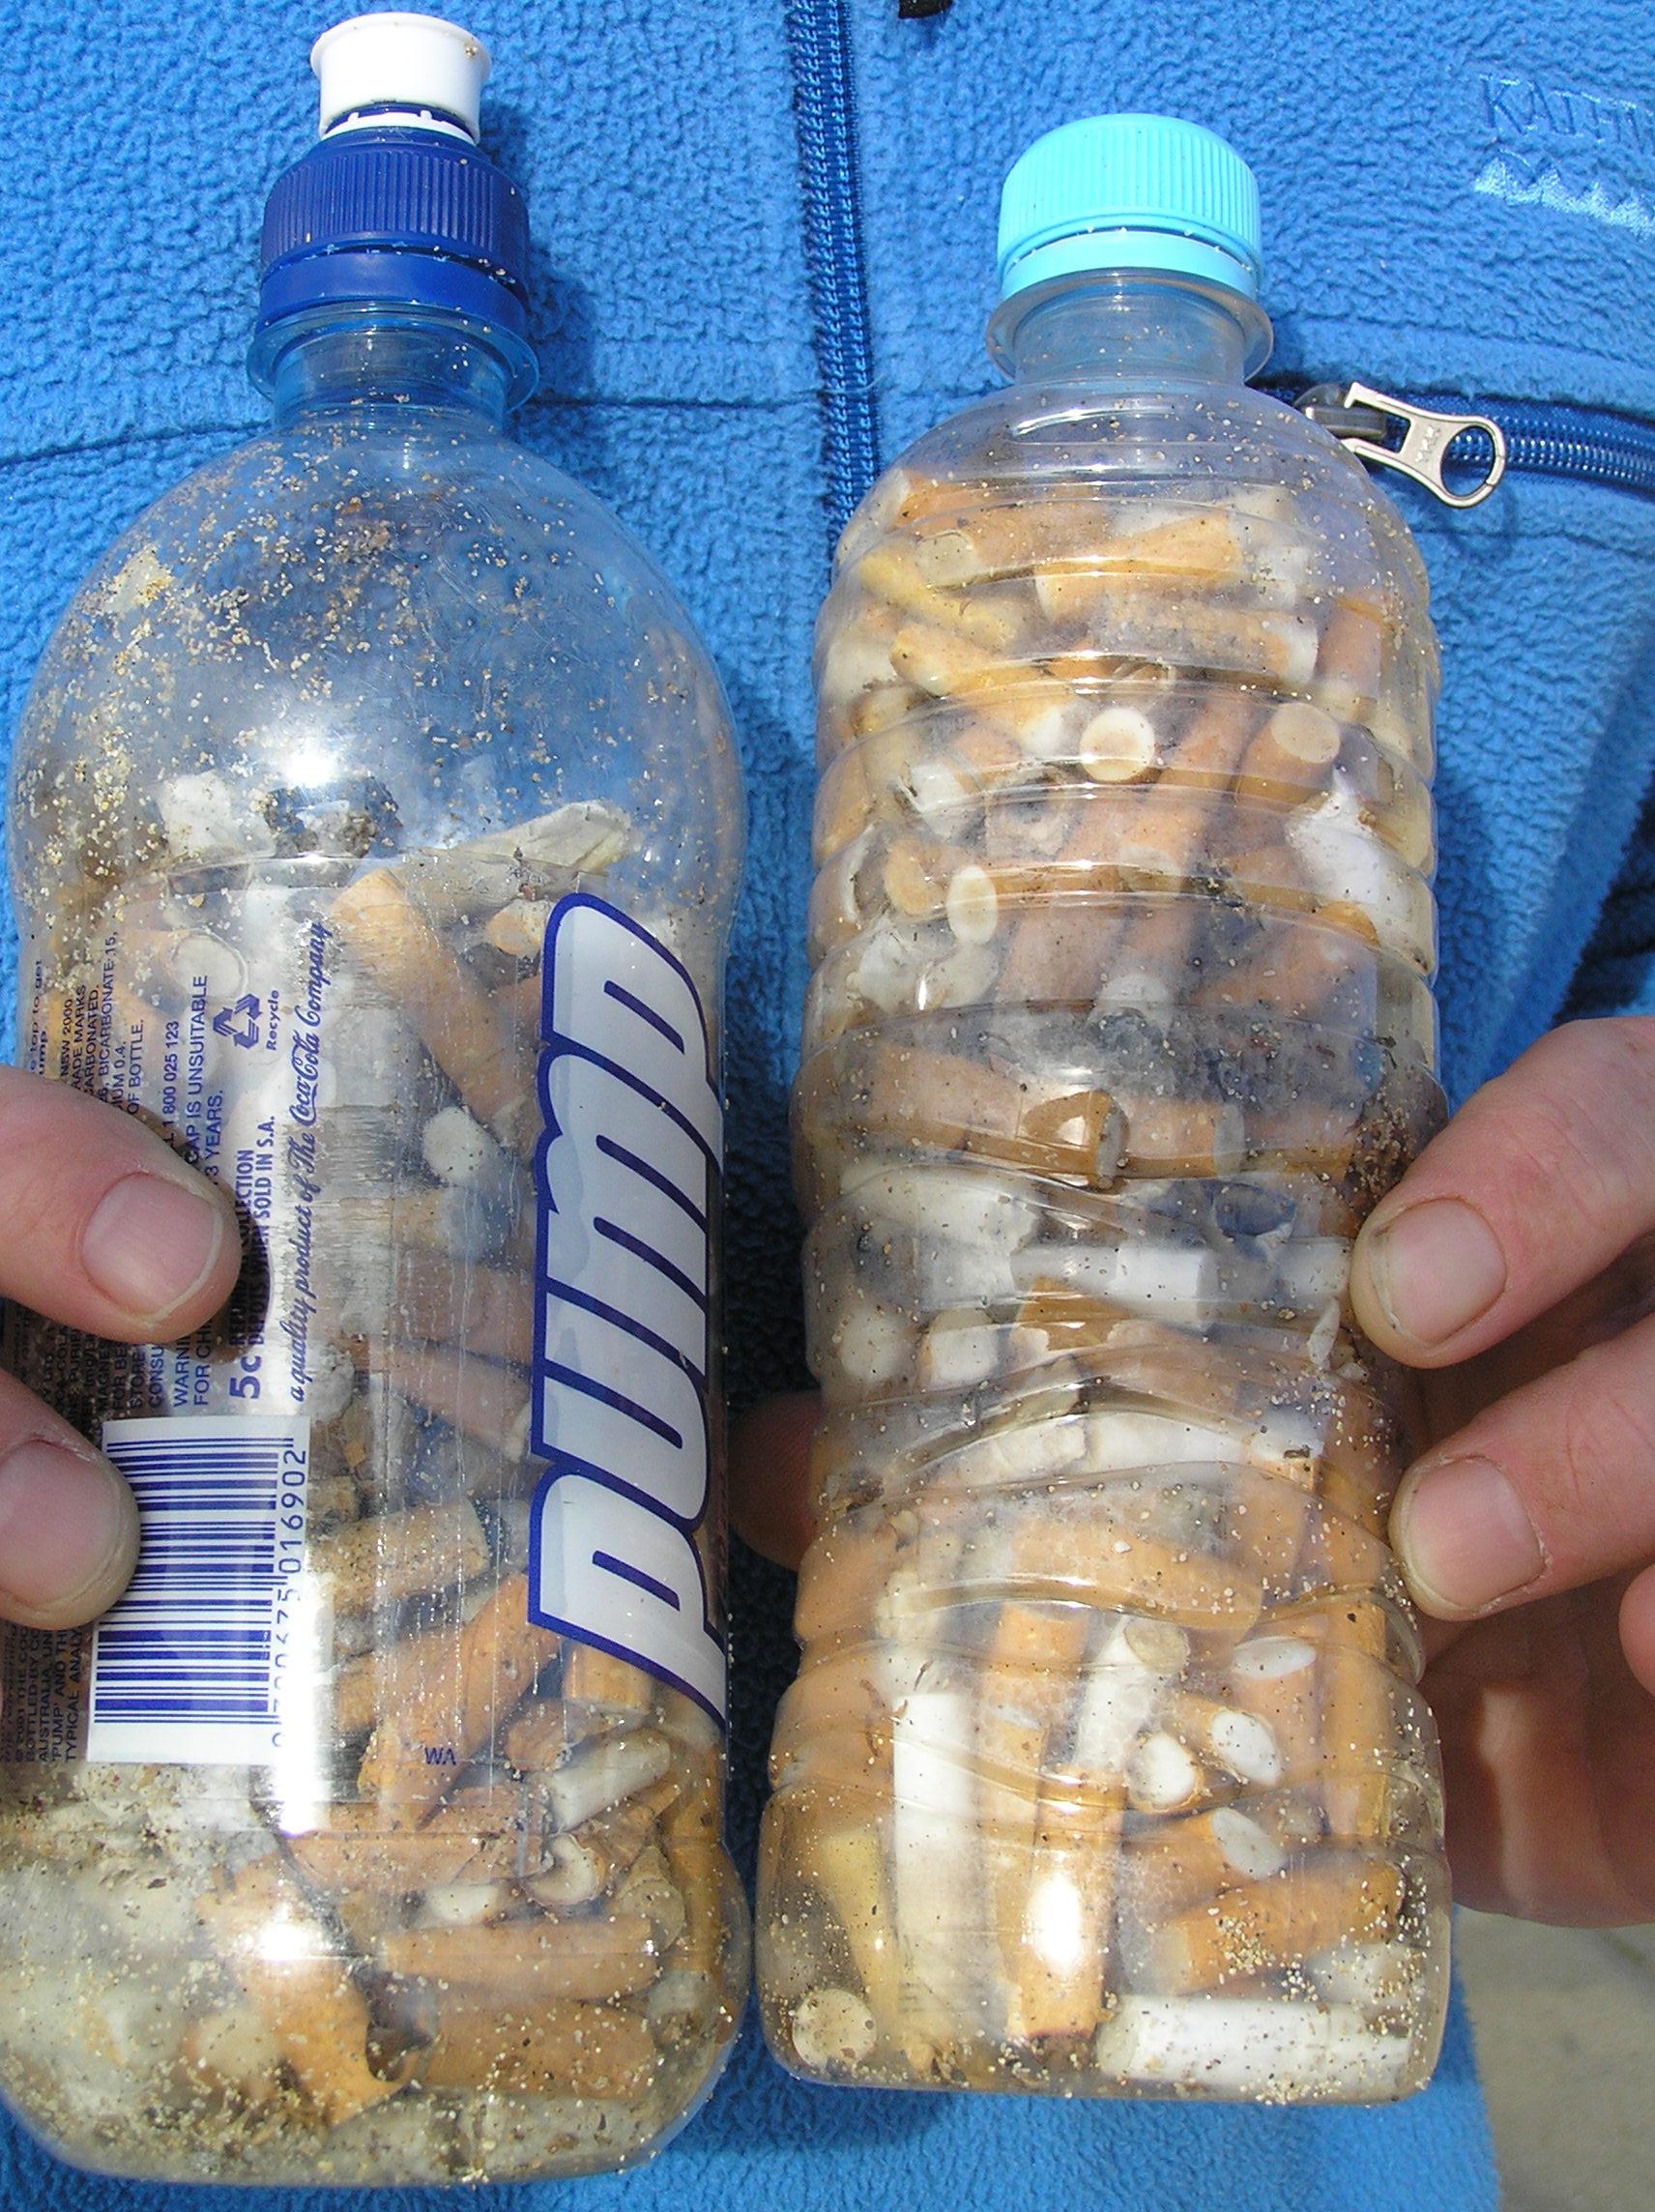 Image result for cigarette butts in water bottles